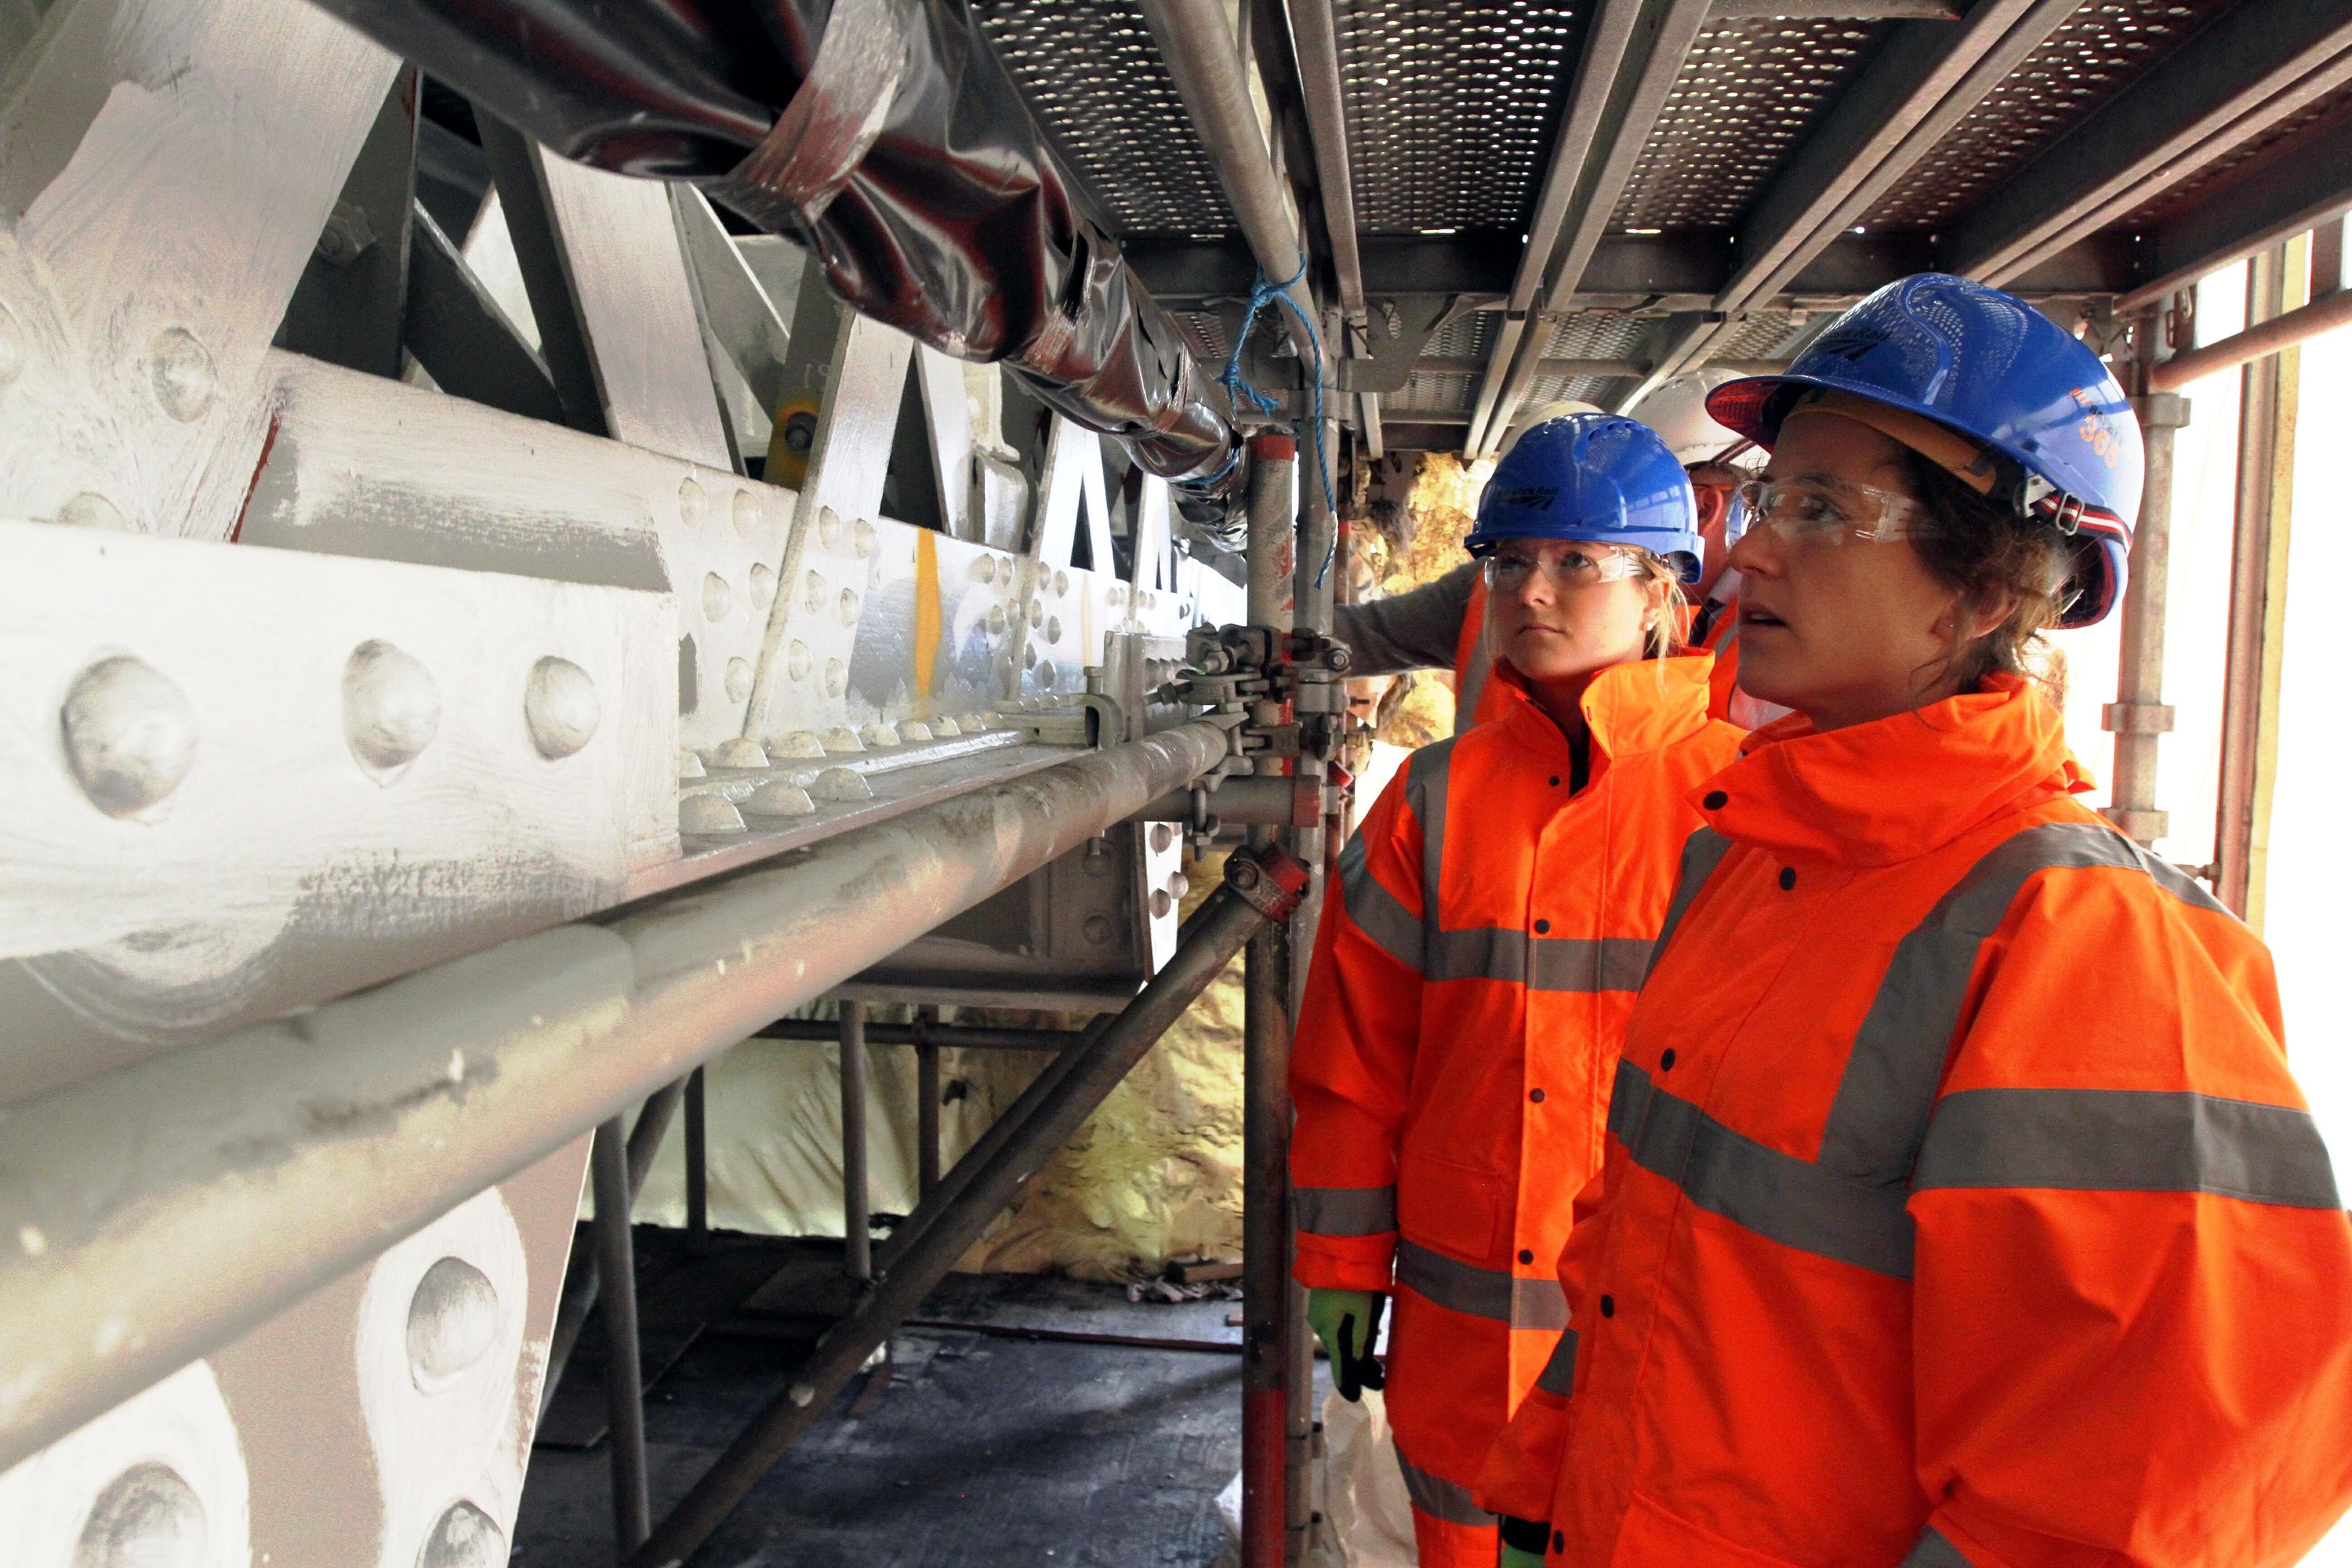 Work is under way on Montrose Viaduct